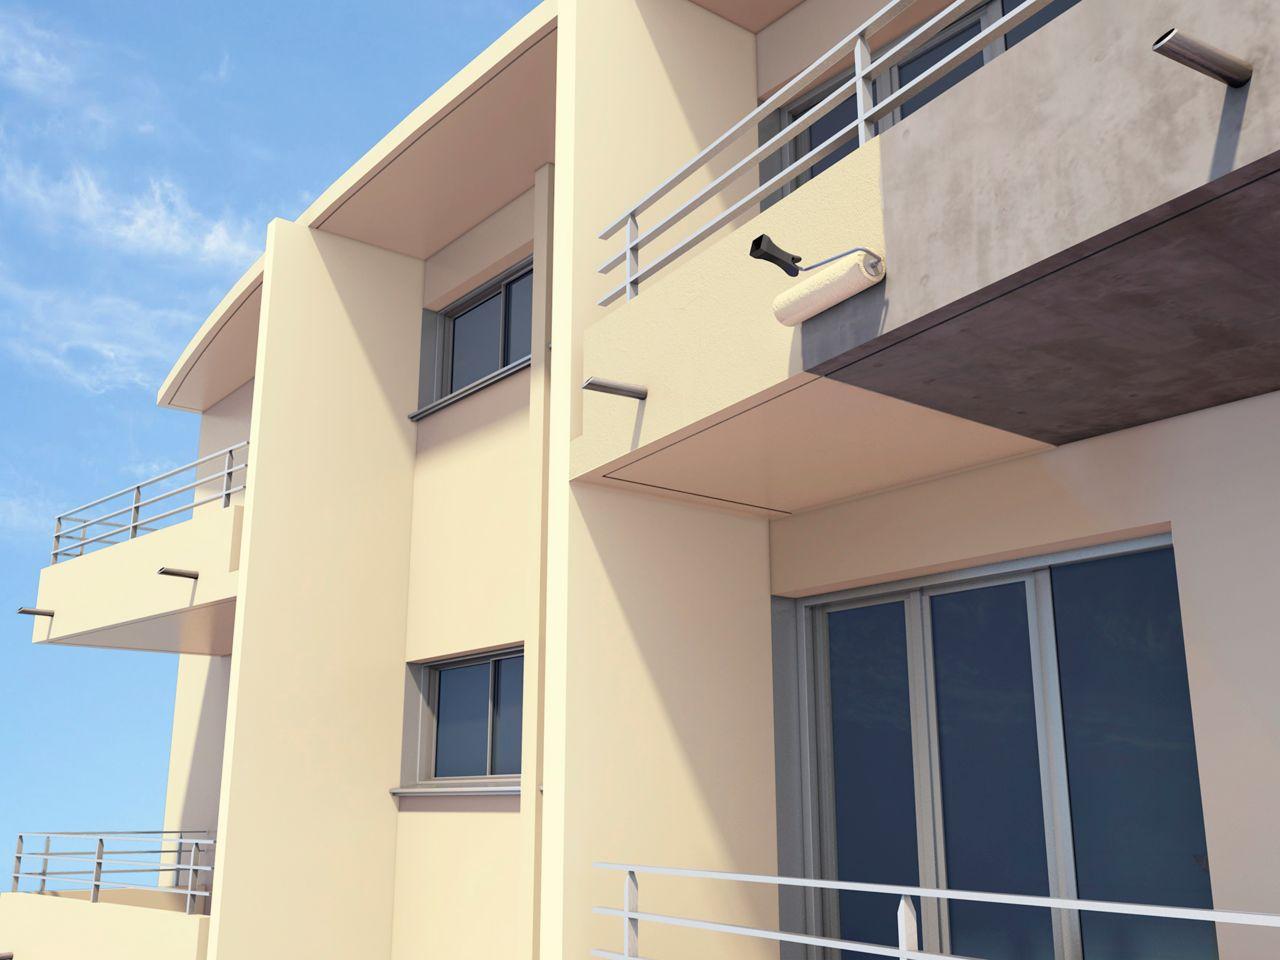 Make it pro facade coating